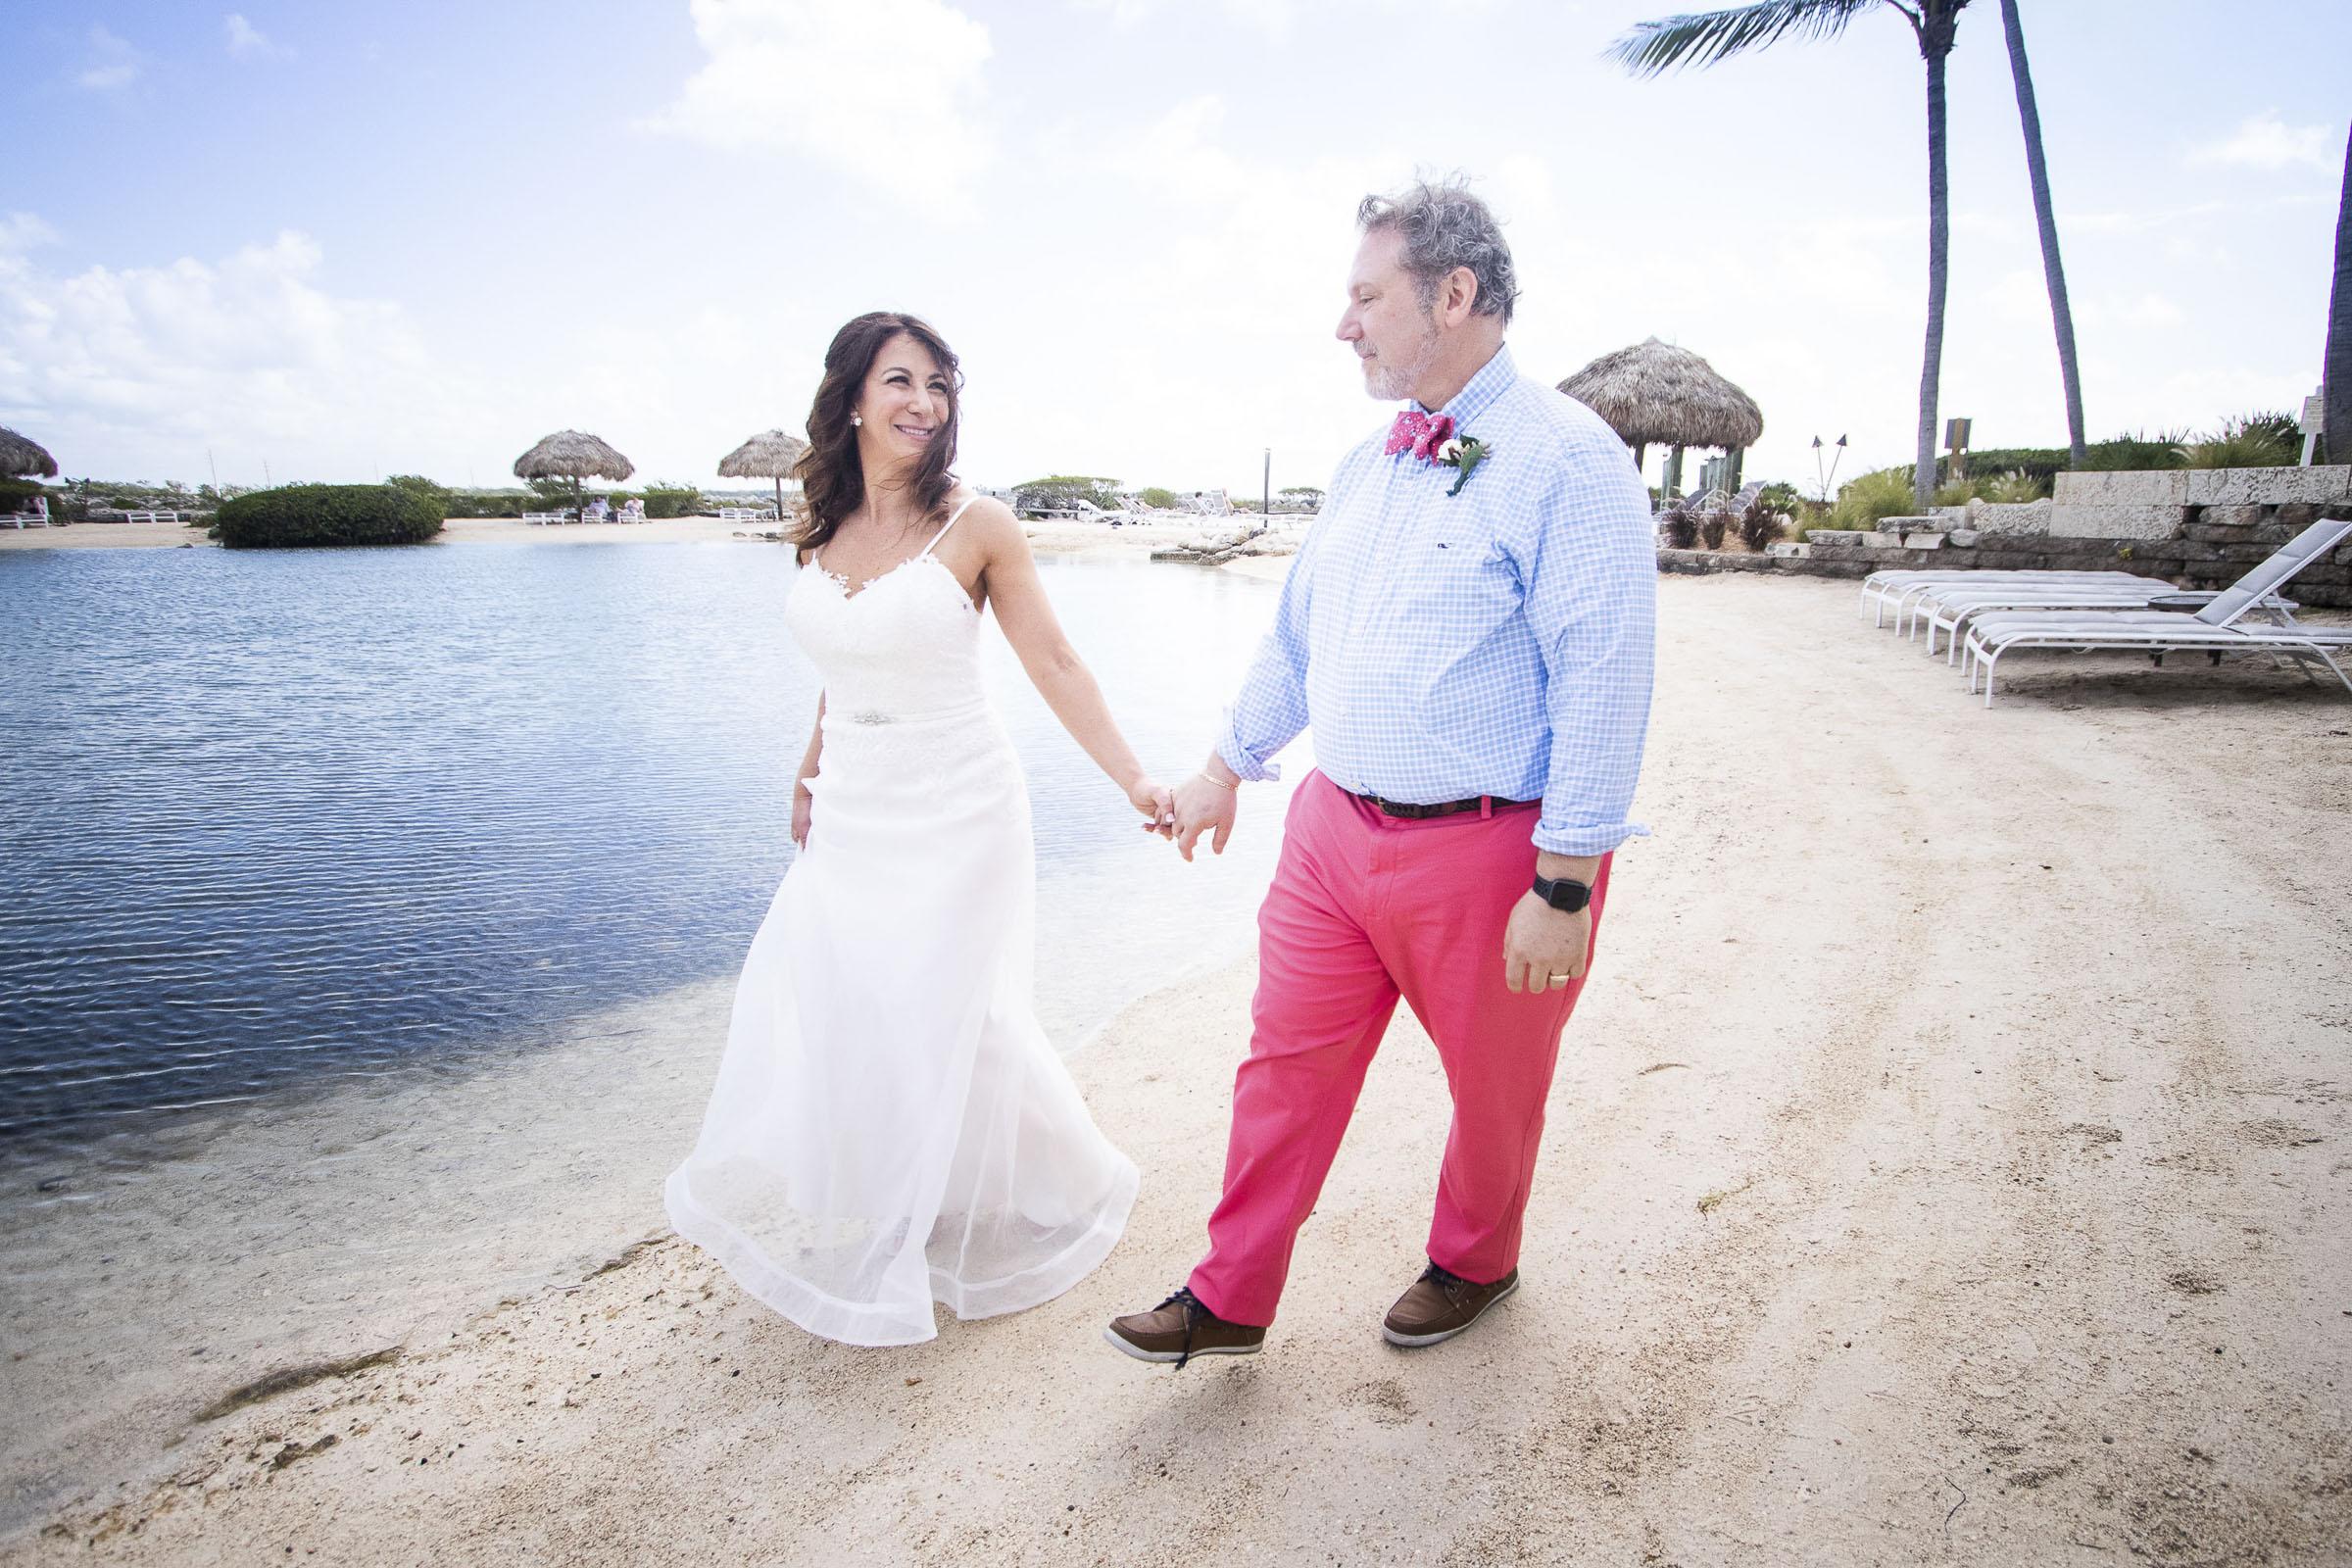 Florida Keys wedding captured by photographer Karrie Porter at Hawks Cay Resort in Duck Key, Florida